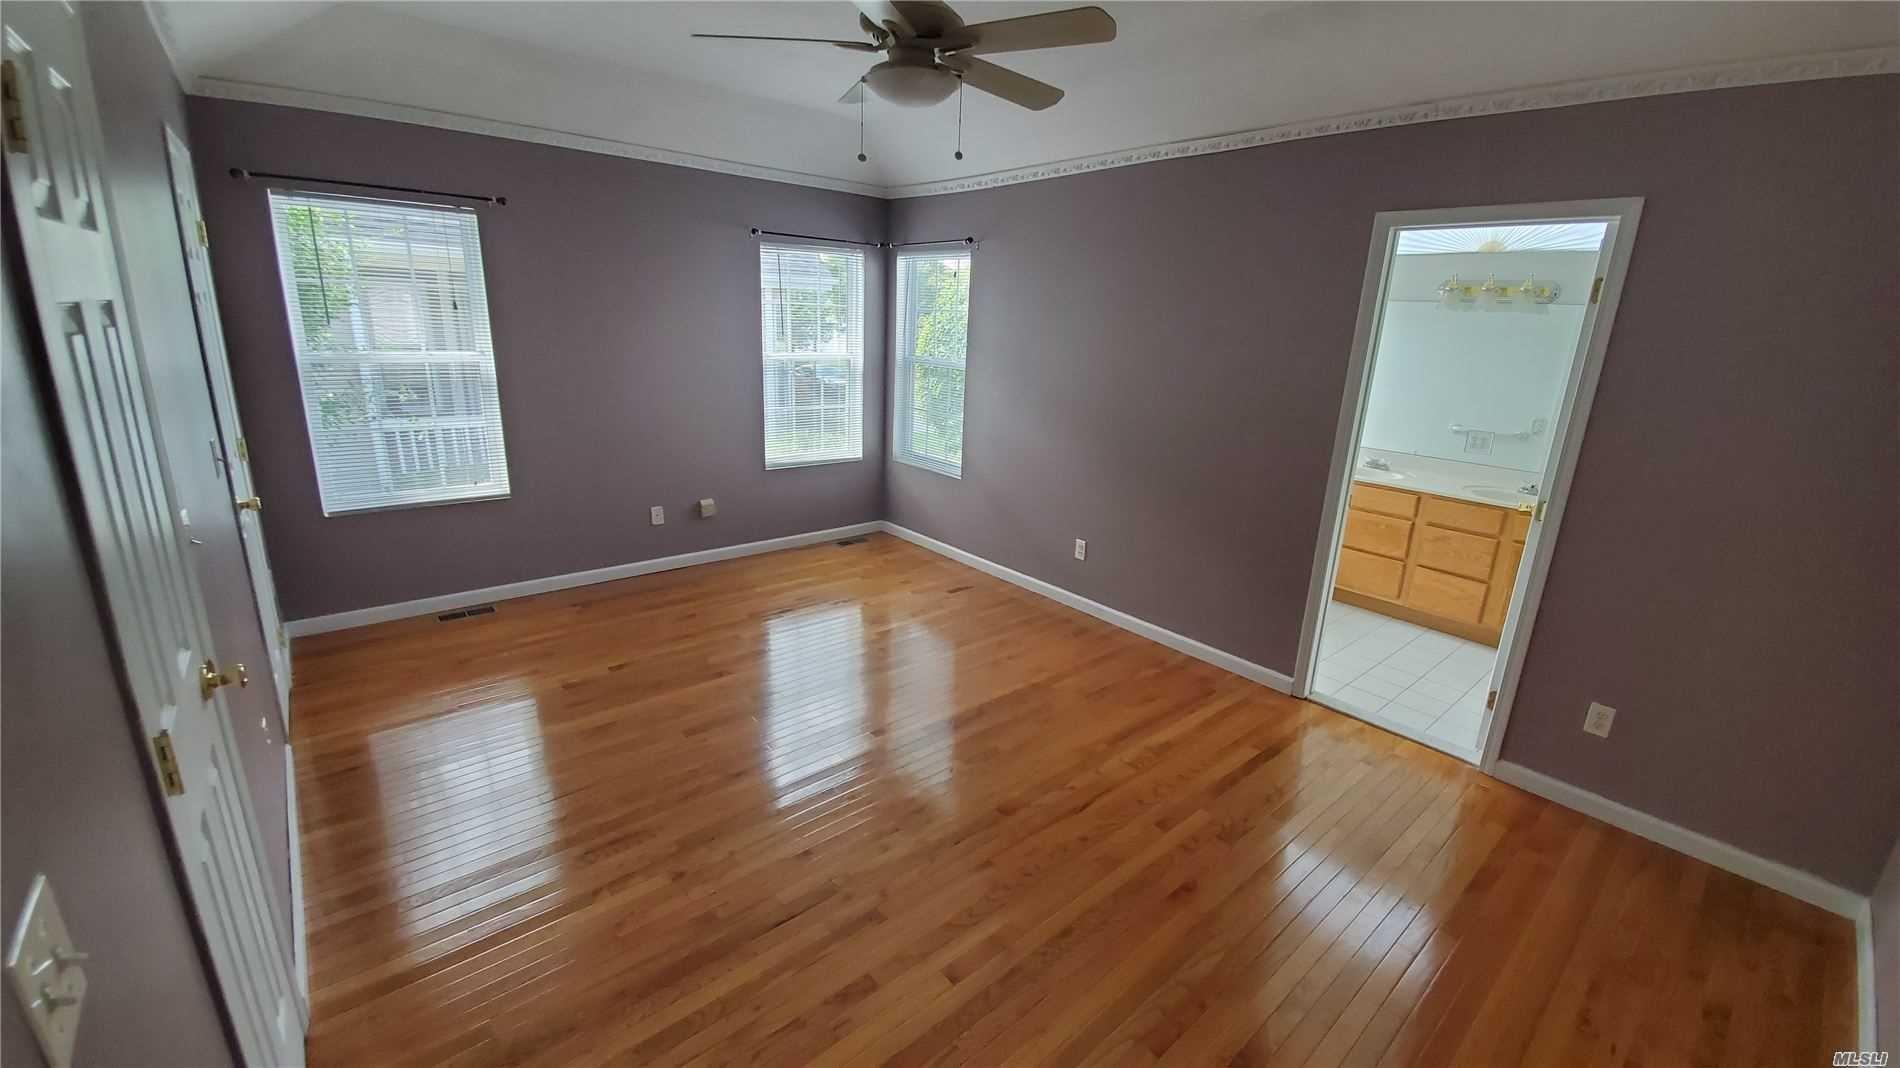 151 Scenic Lake Drive, Riverhead, NY 11901 - MLS#: 3234355